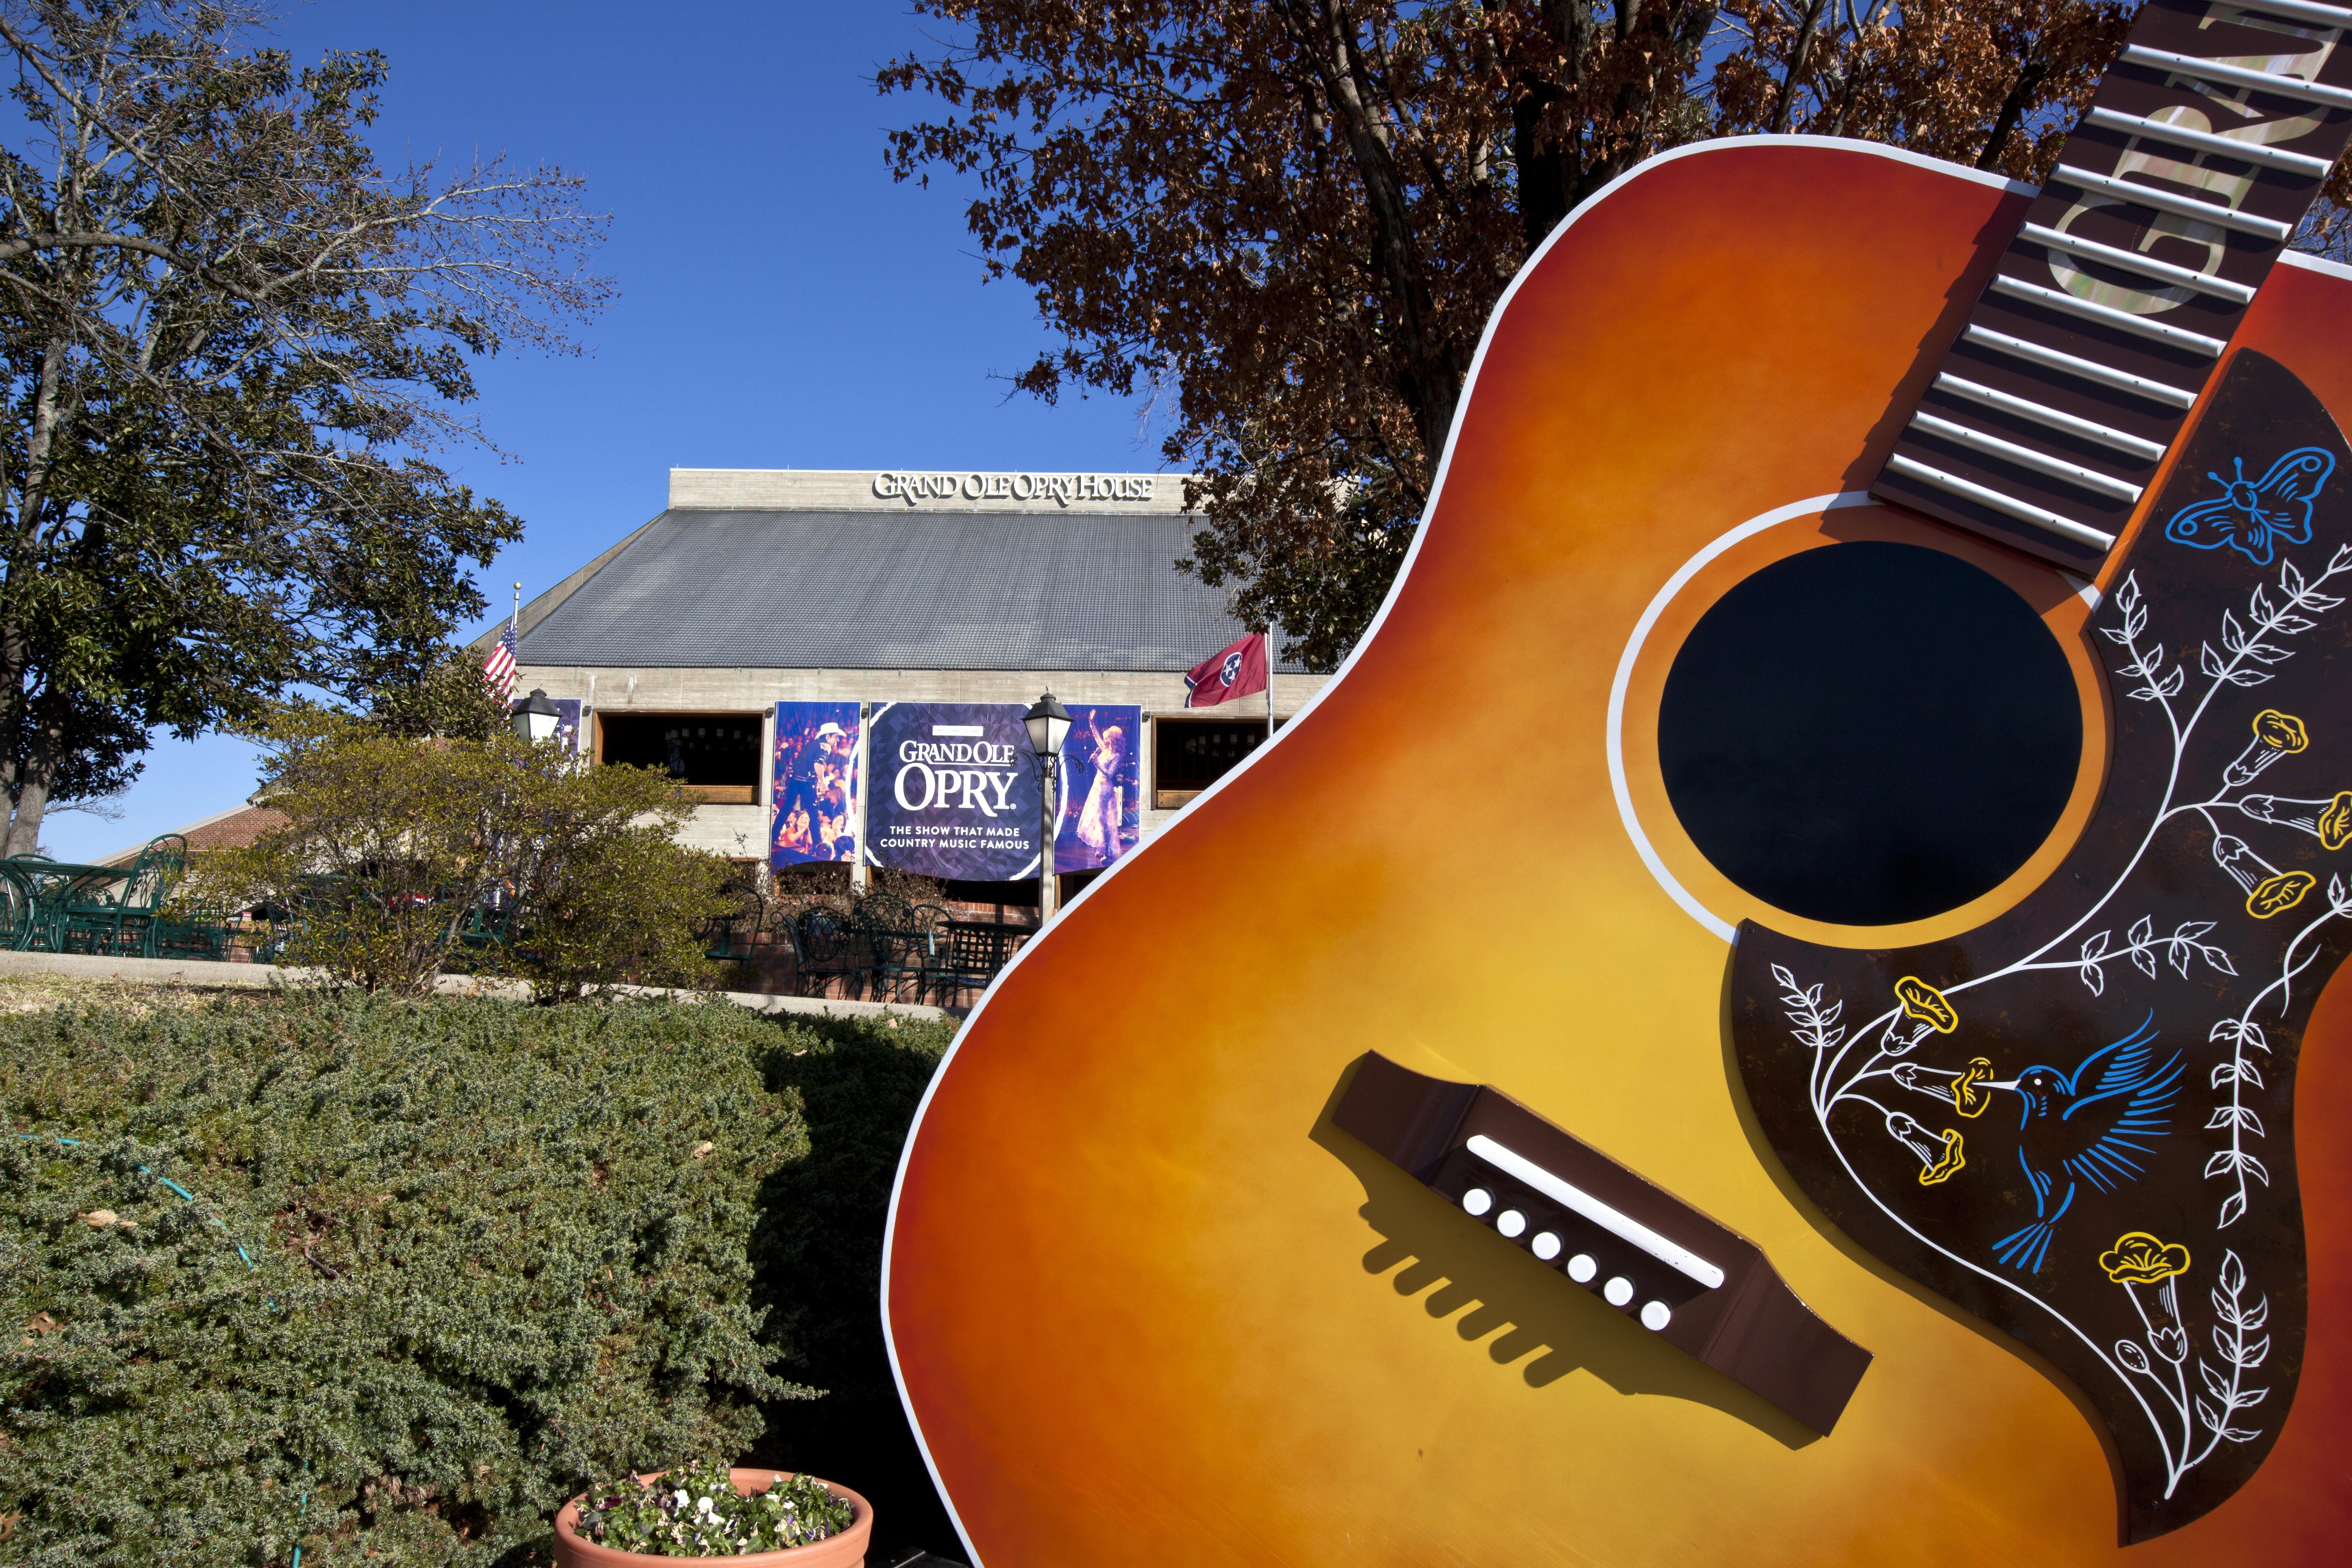 Nashville, Music City USA | WJXA – MIX 92.9